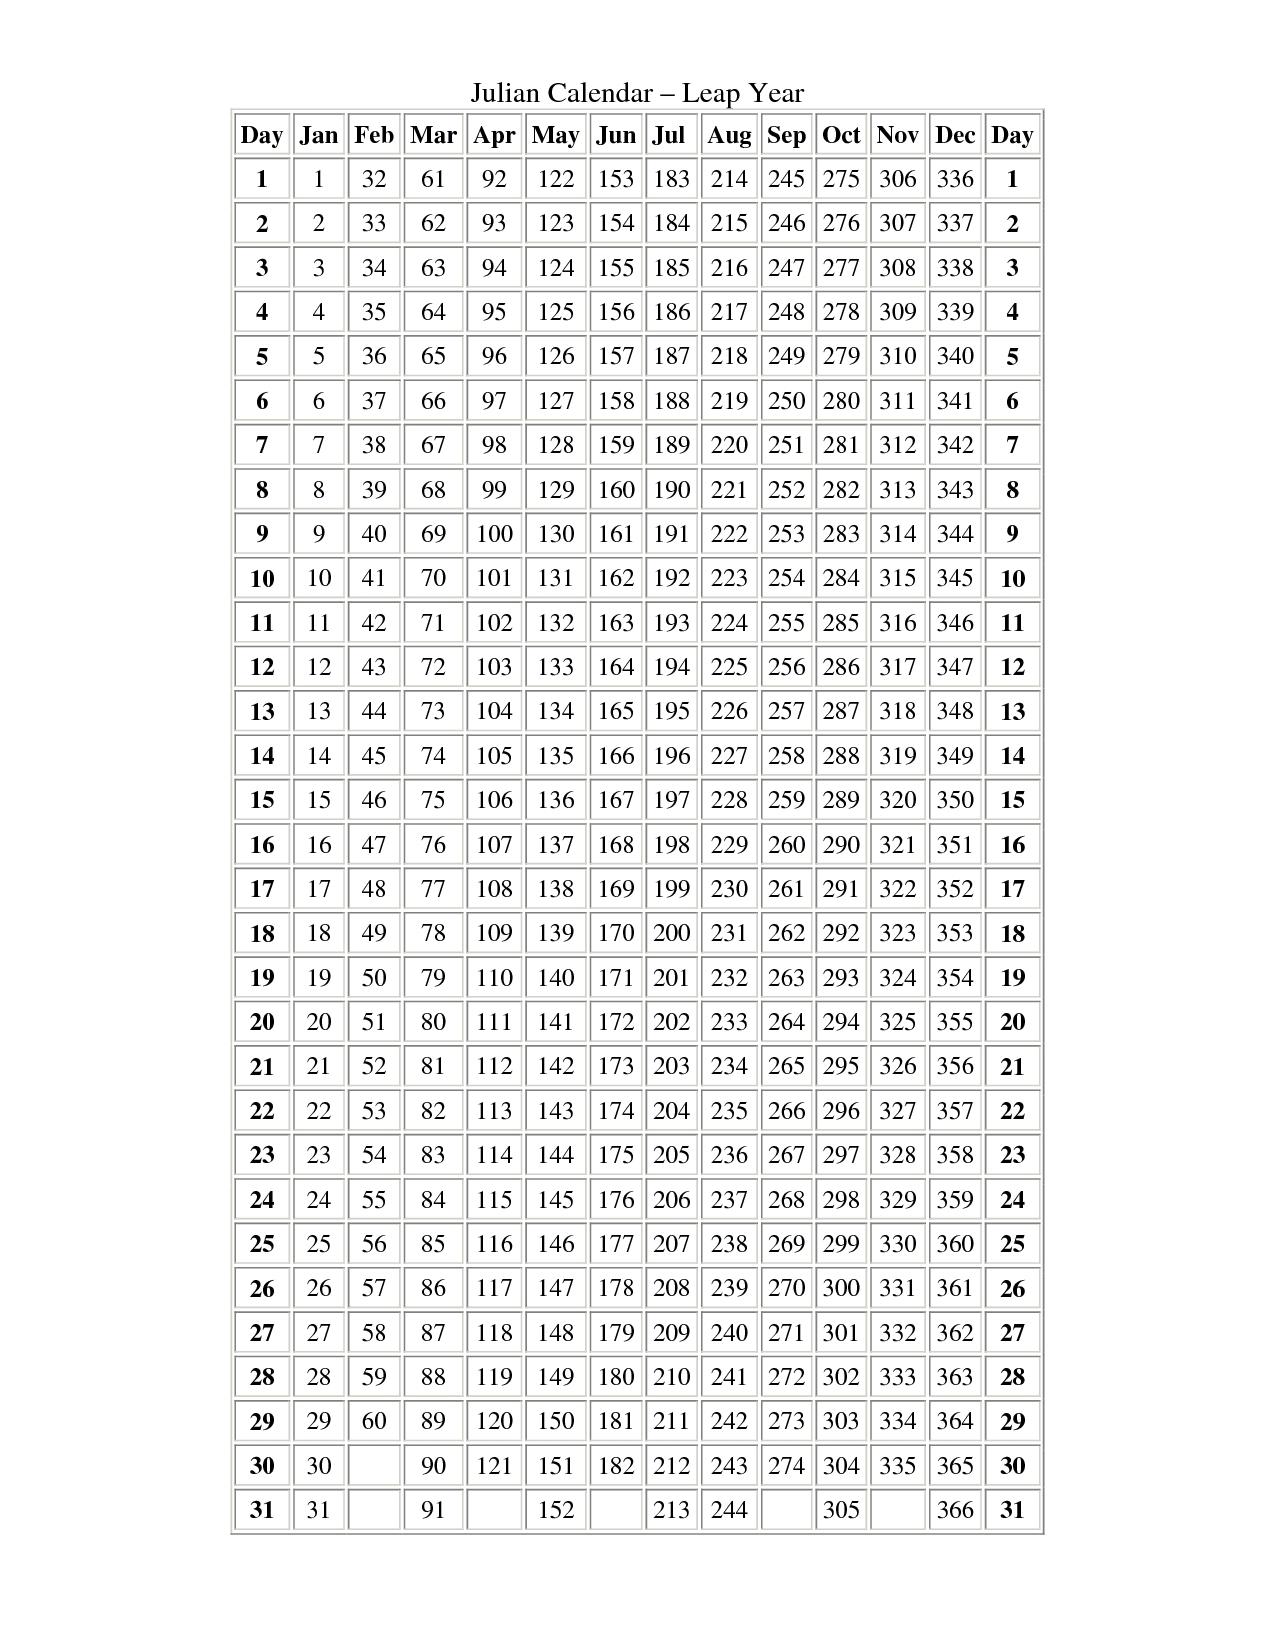 Julian Calendar Leap Year And Non Leap Year | Printable